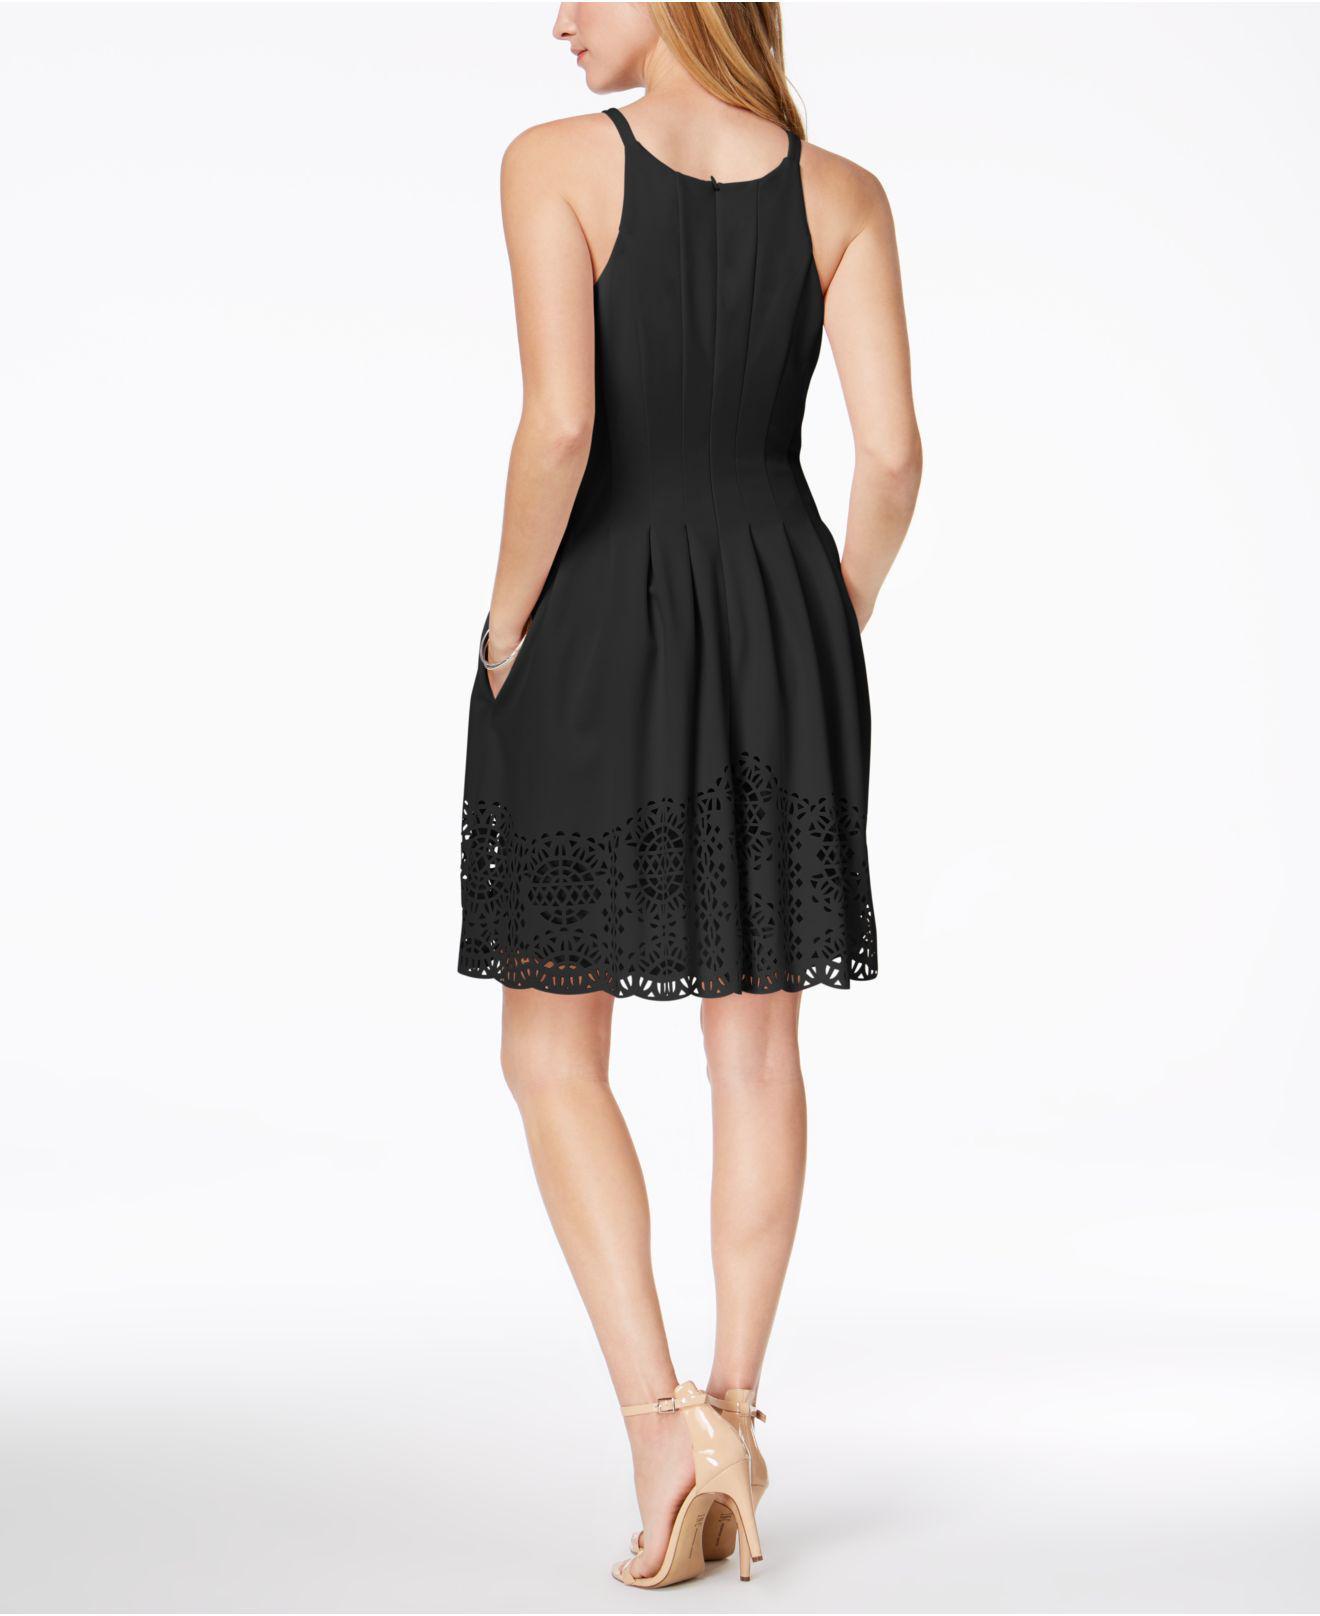 Lyst - Vince Camuto Petite Lasercut Fit   Flare Dress in Black 394b57e98